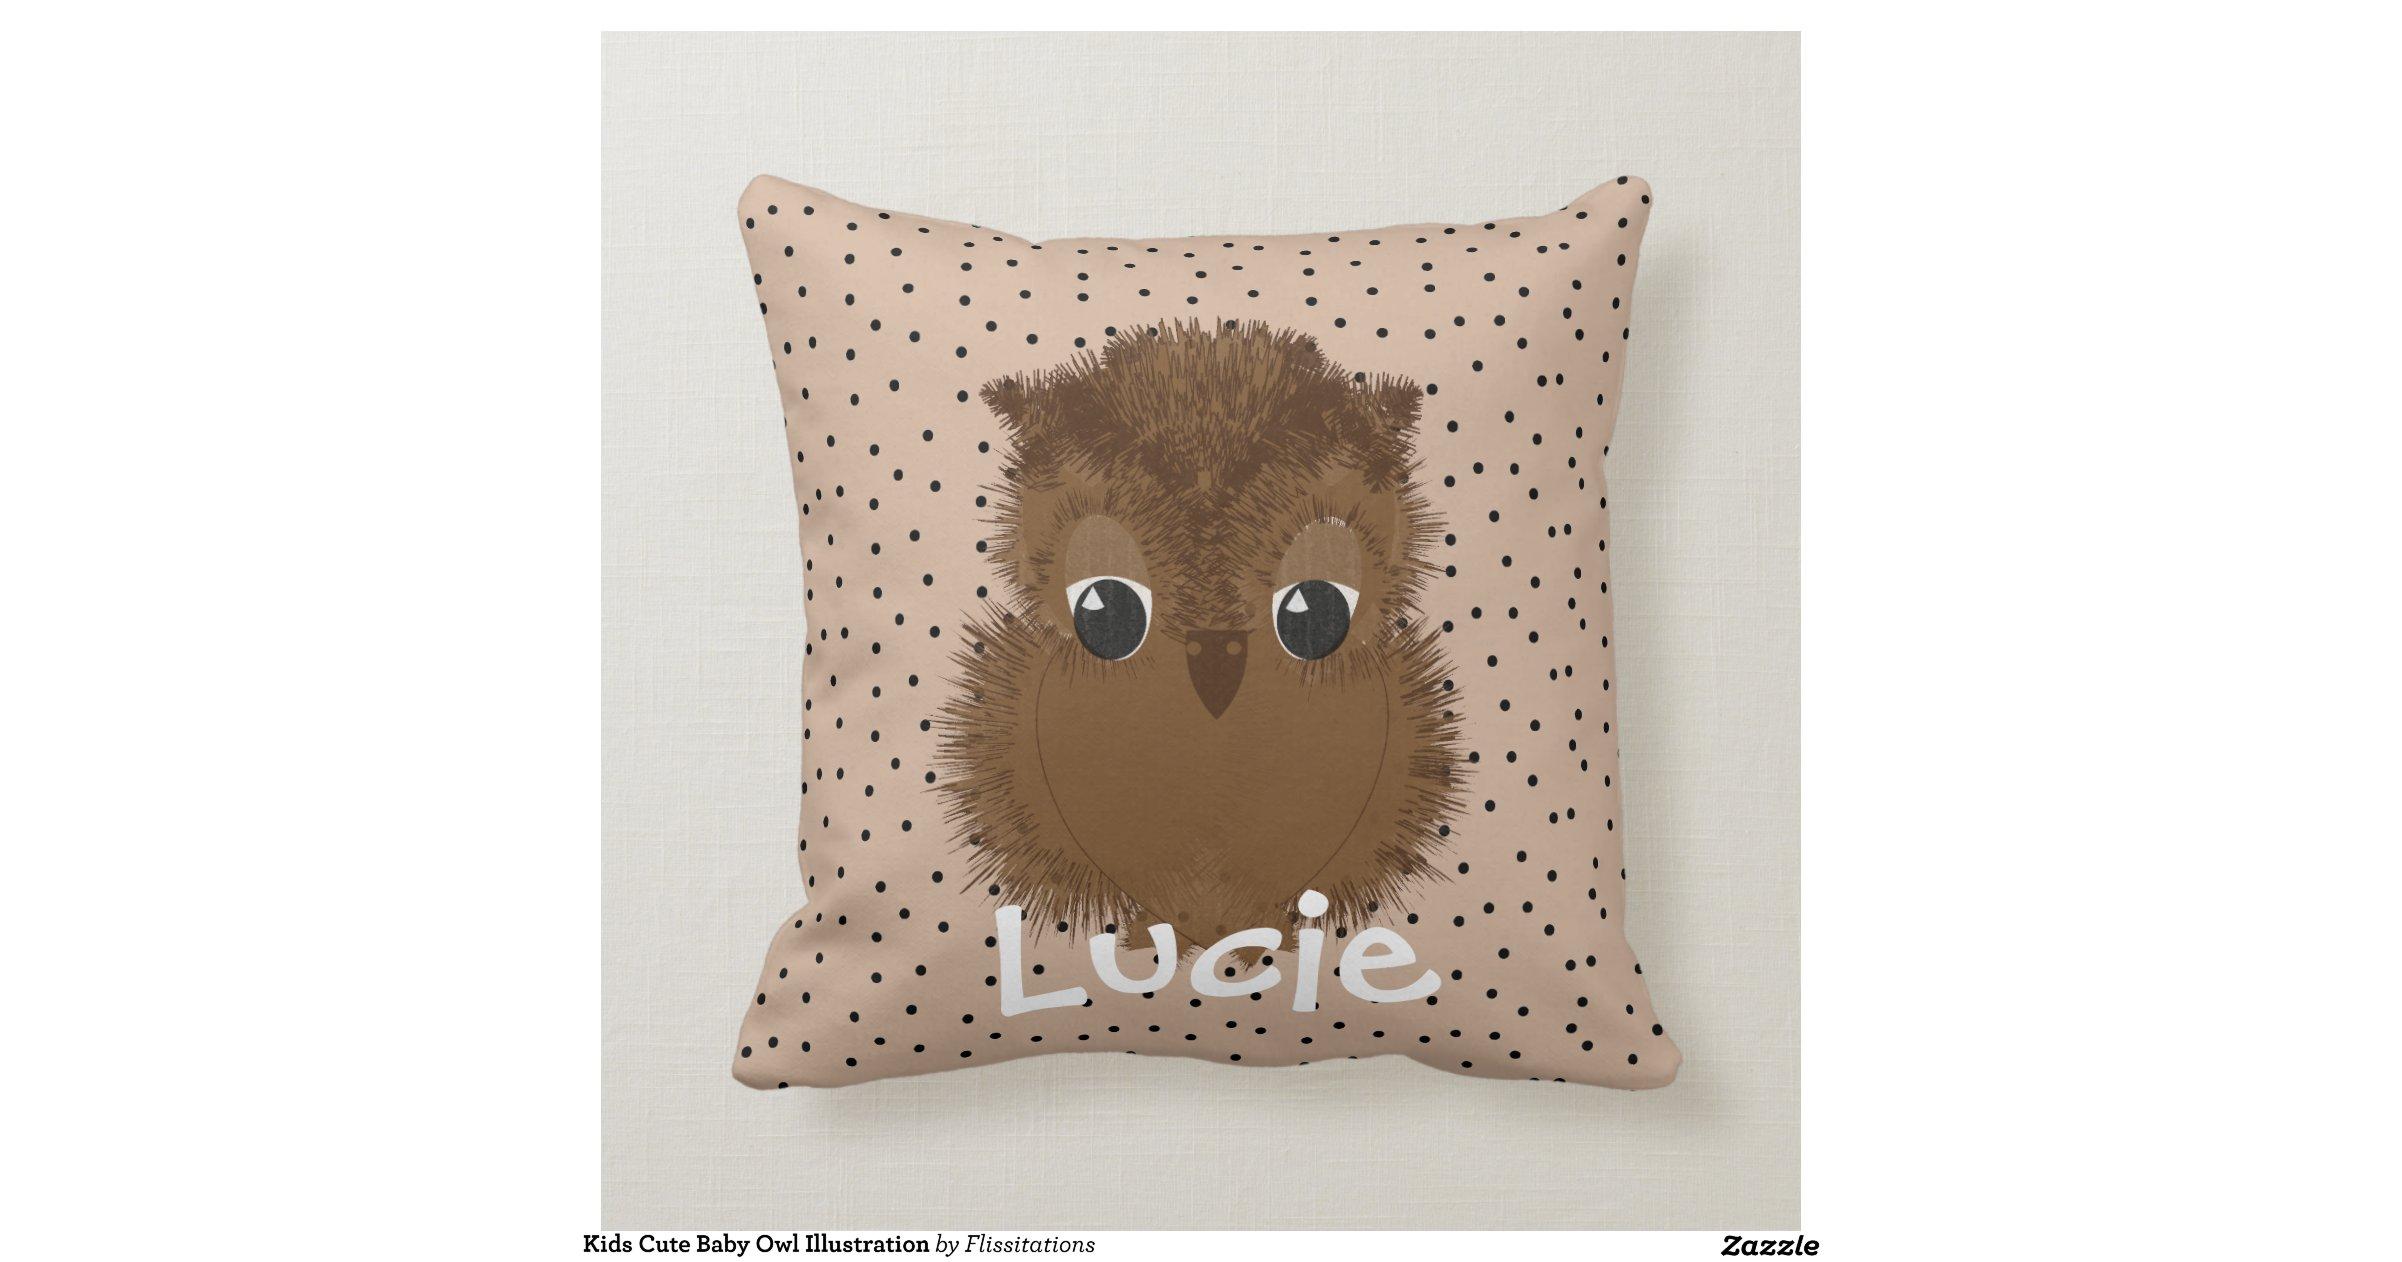 Cute Pillow Illustration : kids_cute_baby_owl_illustration_throw_pillows-r0bd97cb8e06241b493690b89f1dd09d1_i5fqz_8byvr_1200 ...